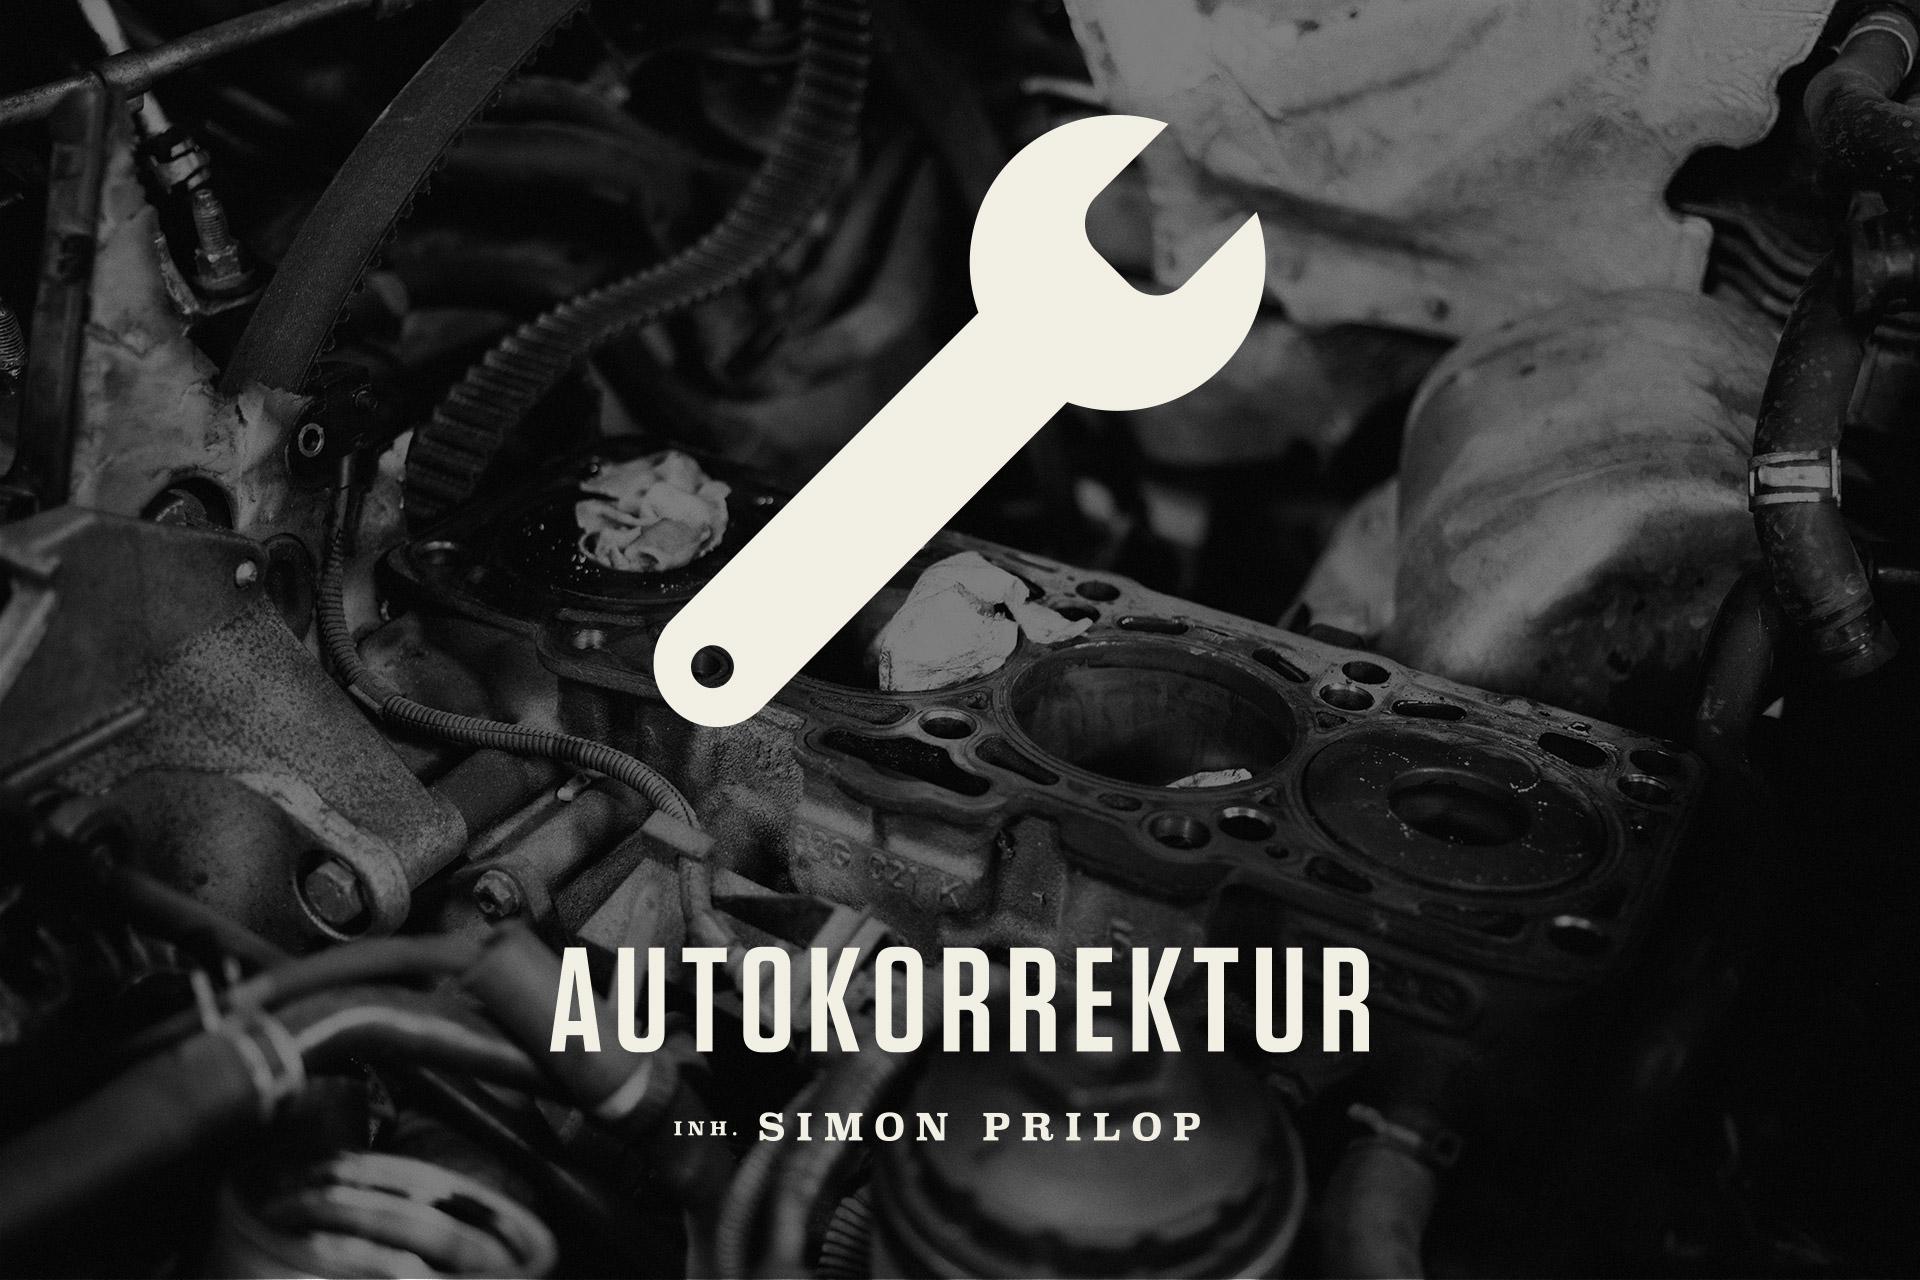 autokorrektur-1920